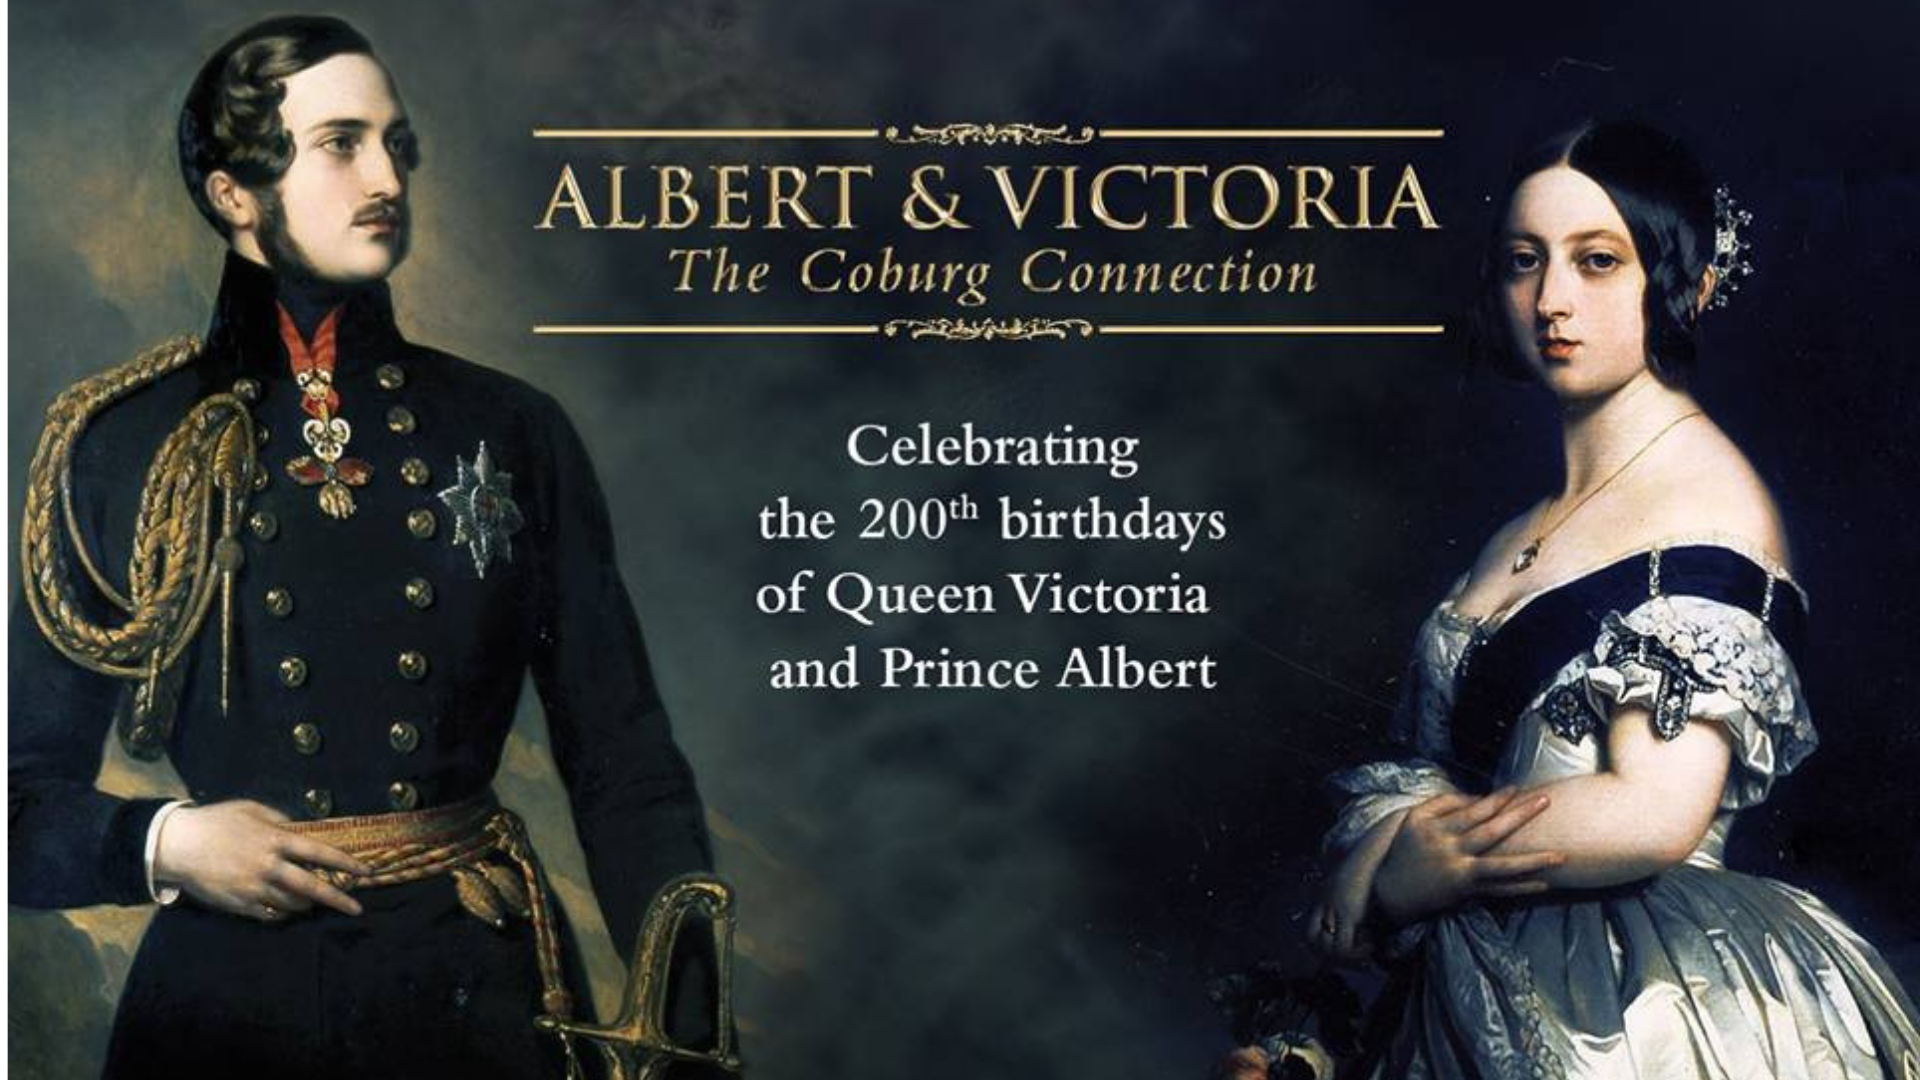 Albert & Victoria: The Coburg Connection